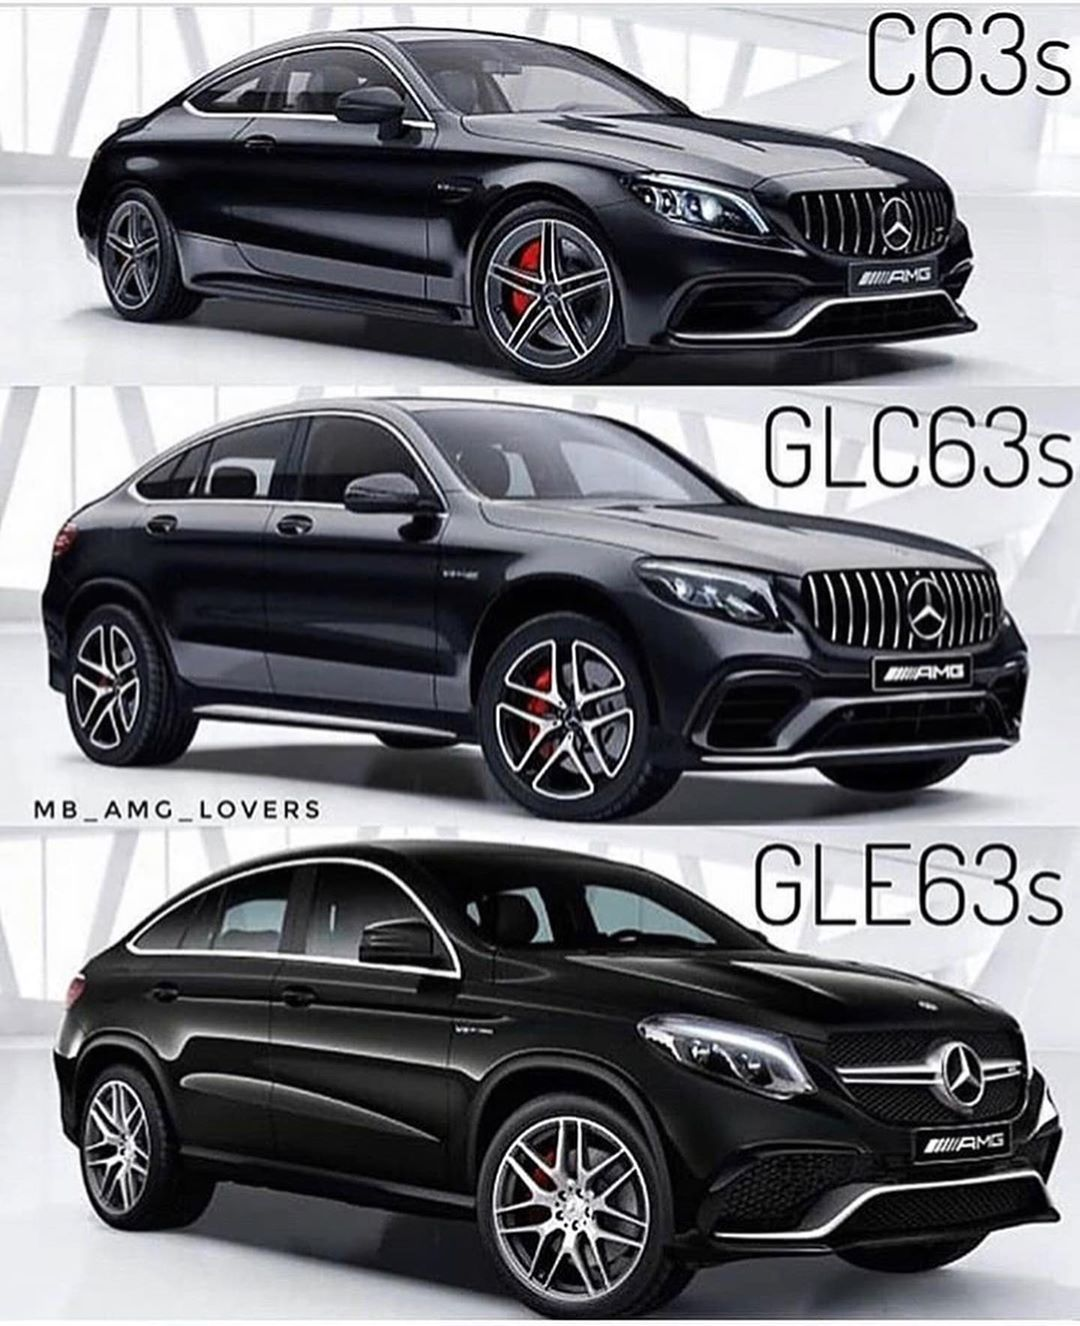 C63s Glc63s Or Gle63s Nbsp Nbsp Mb Nbsp Nbsp Amg Lovers Follow The Crew Amg Gang Nbsp Nbsp Mercedes Amg Mercedes Benz Cars Amg Car